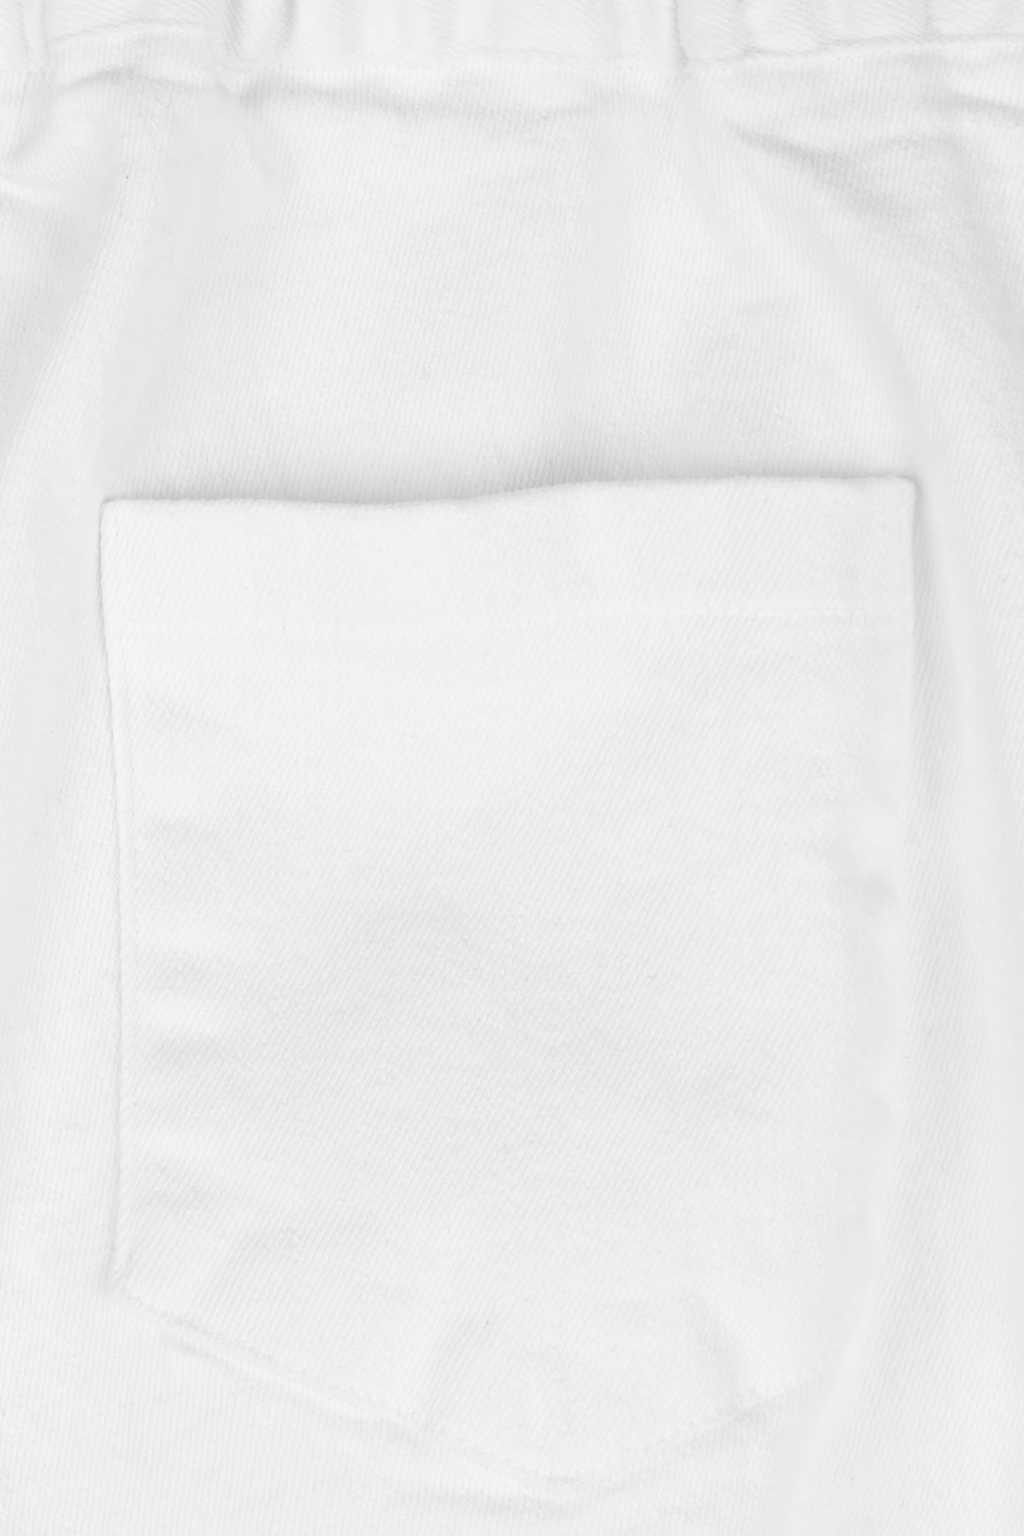 Pant K001 White 5